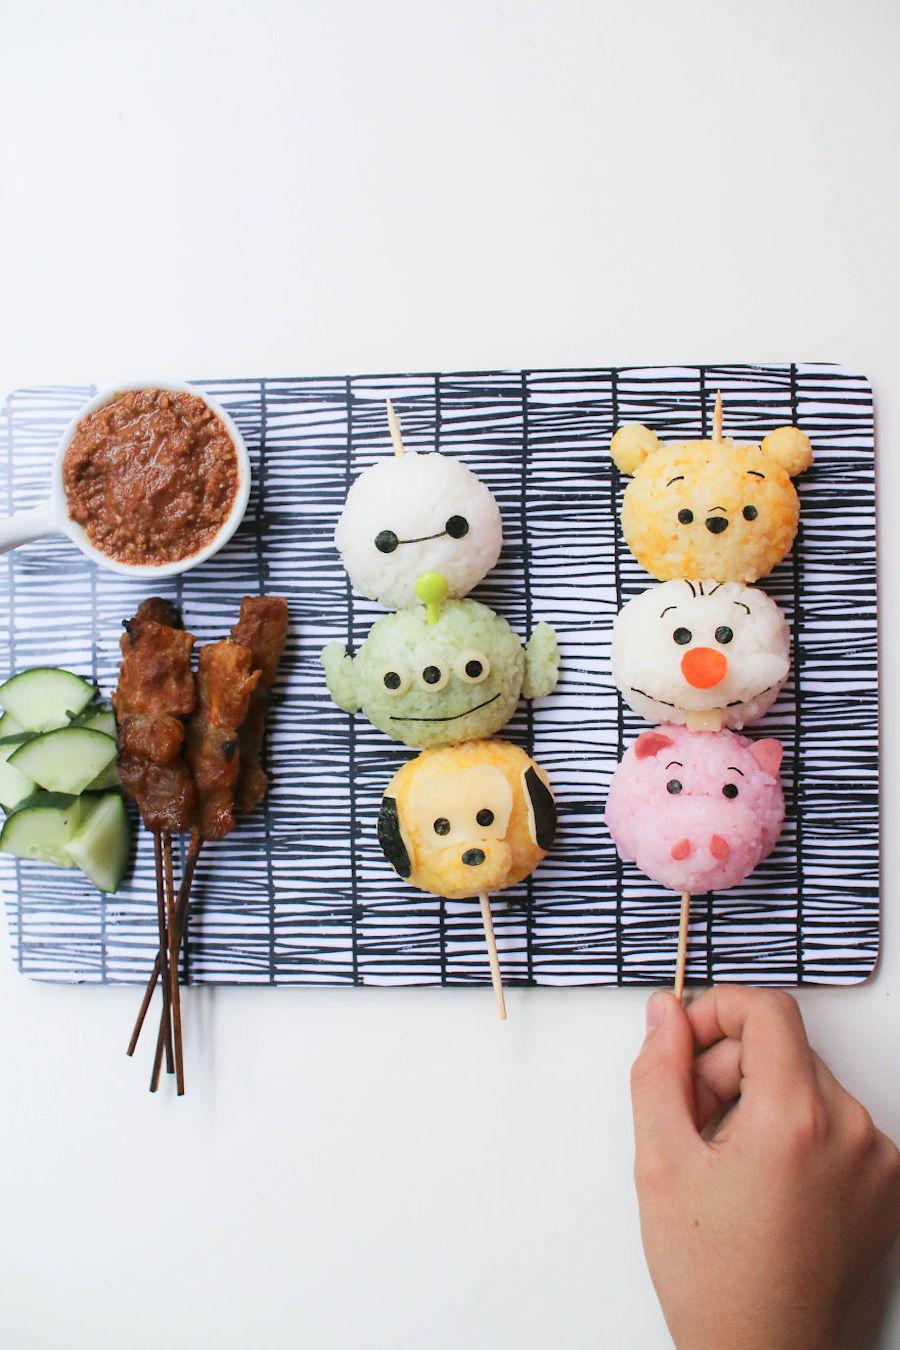 bento-cibo-pasto-decorazioni-bambini-cartoni-bentomonsters-04